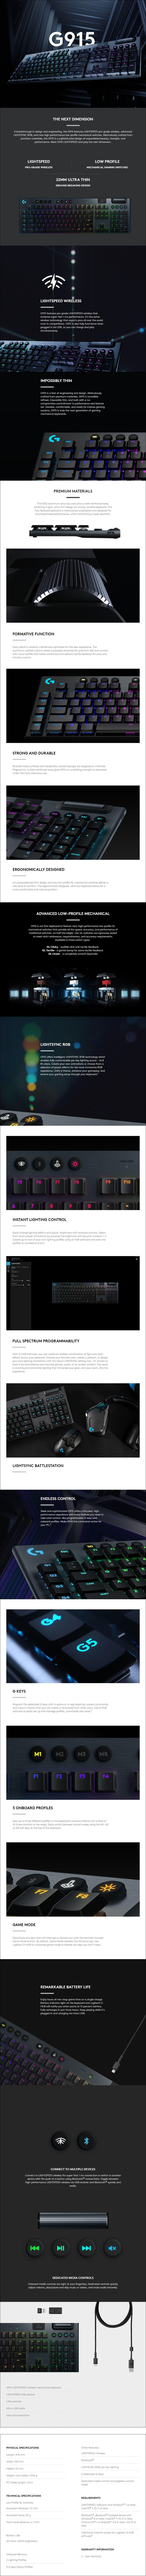 logitech-g915-lightspeed-wireless-rgb-mechanical-gaming-keyboard-gl-tactile-ac26671-7-1-.jpg